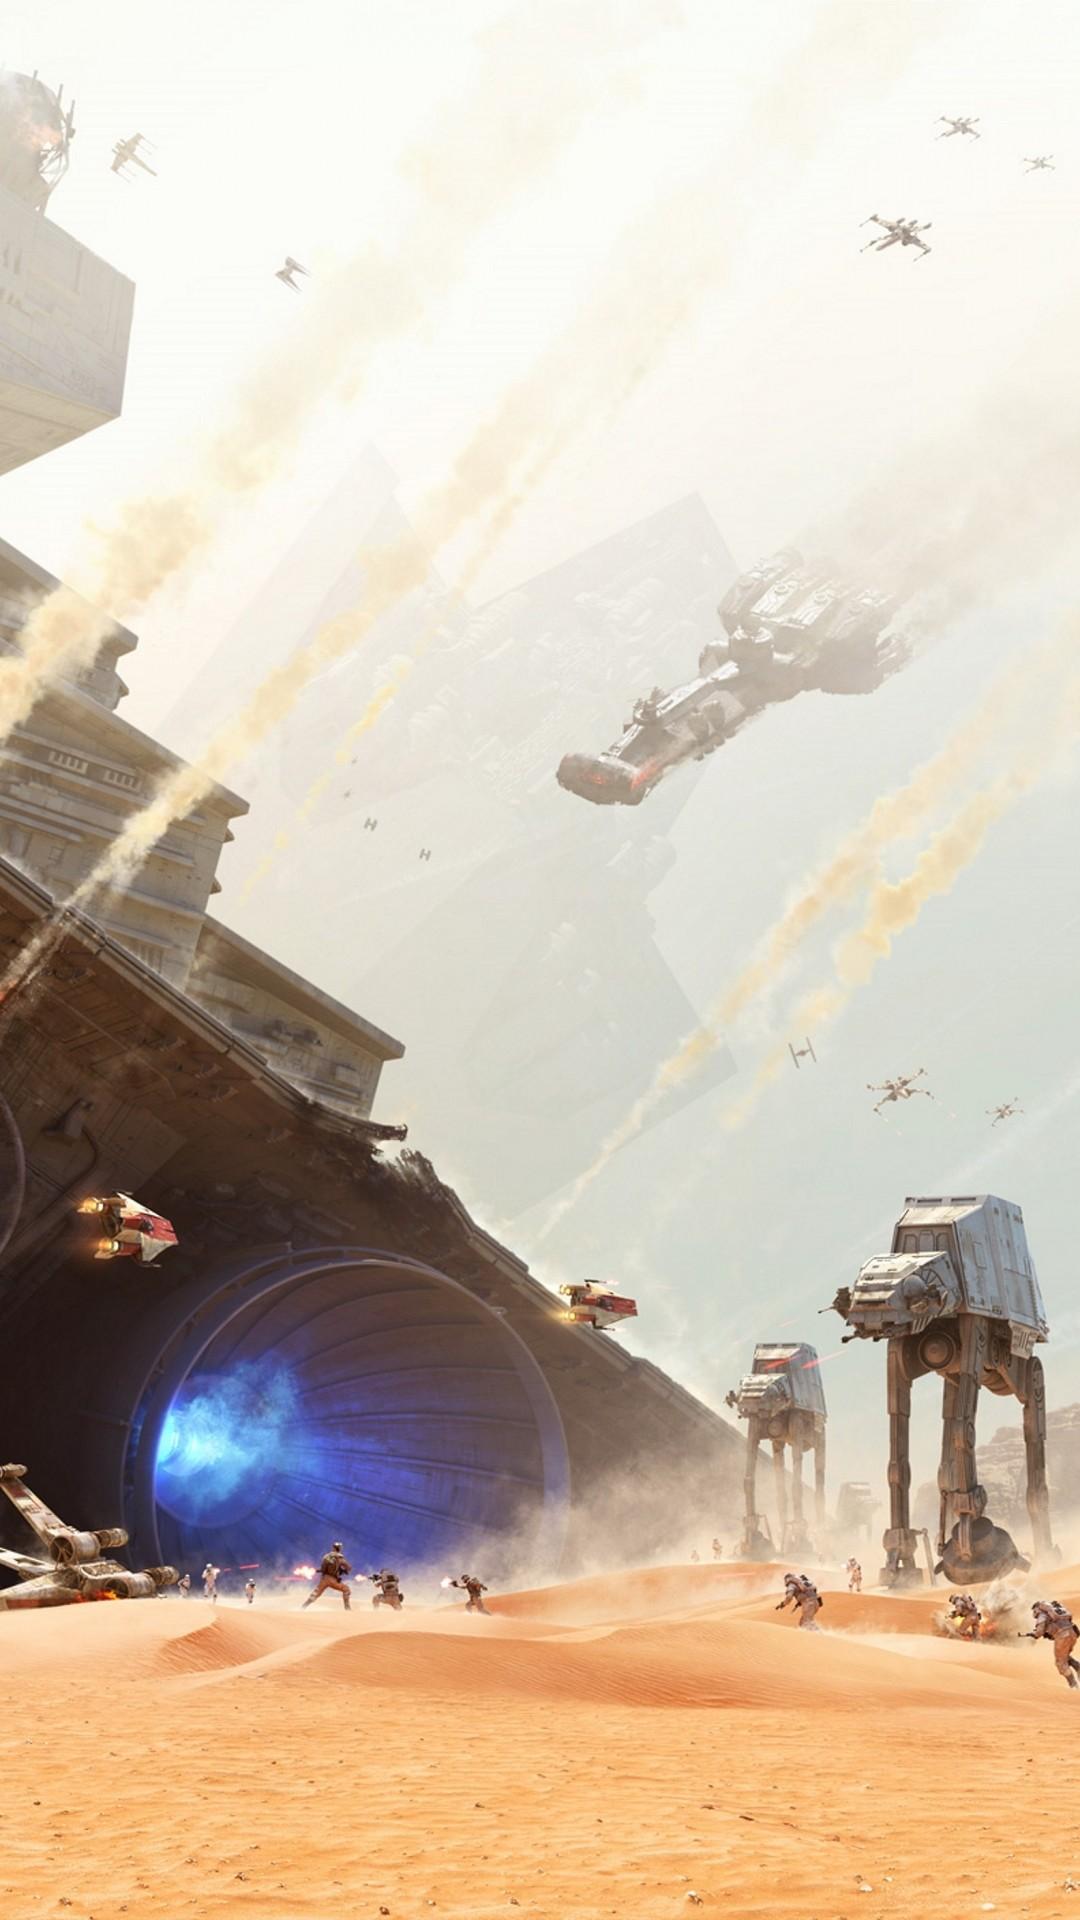 Star Wars The Force Awakens Wallpaper Jakku Graveyard